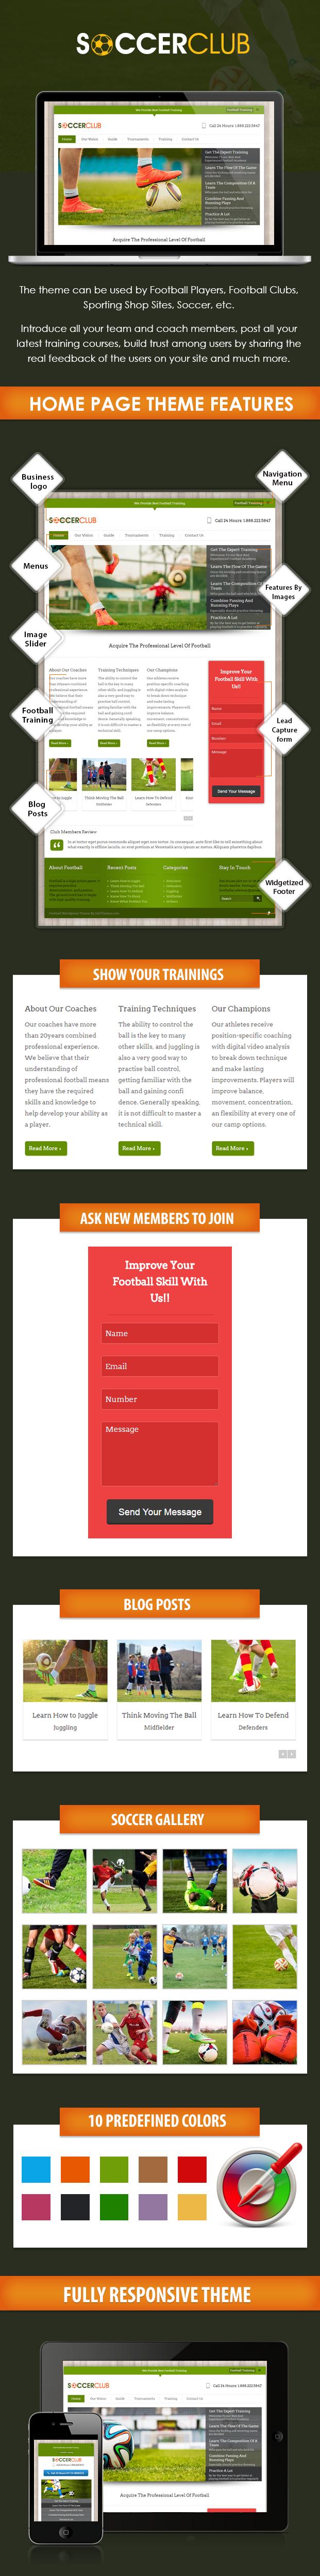 WordPress Football Theme InkThemes Sales Page Preview